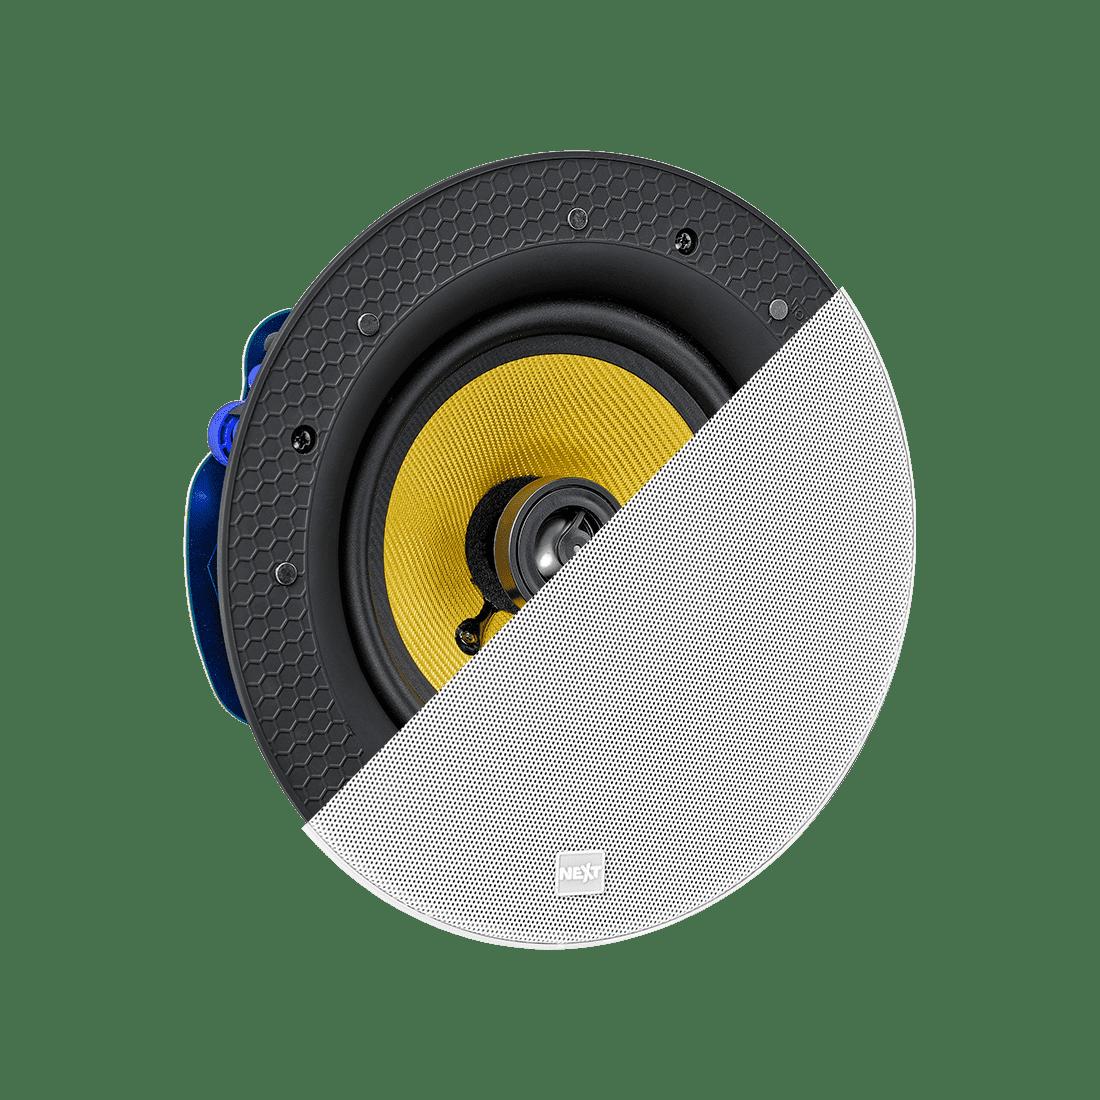 Loa âm trần cao cấp 60W NEXT C6 Pro